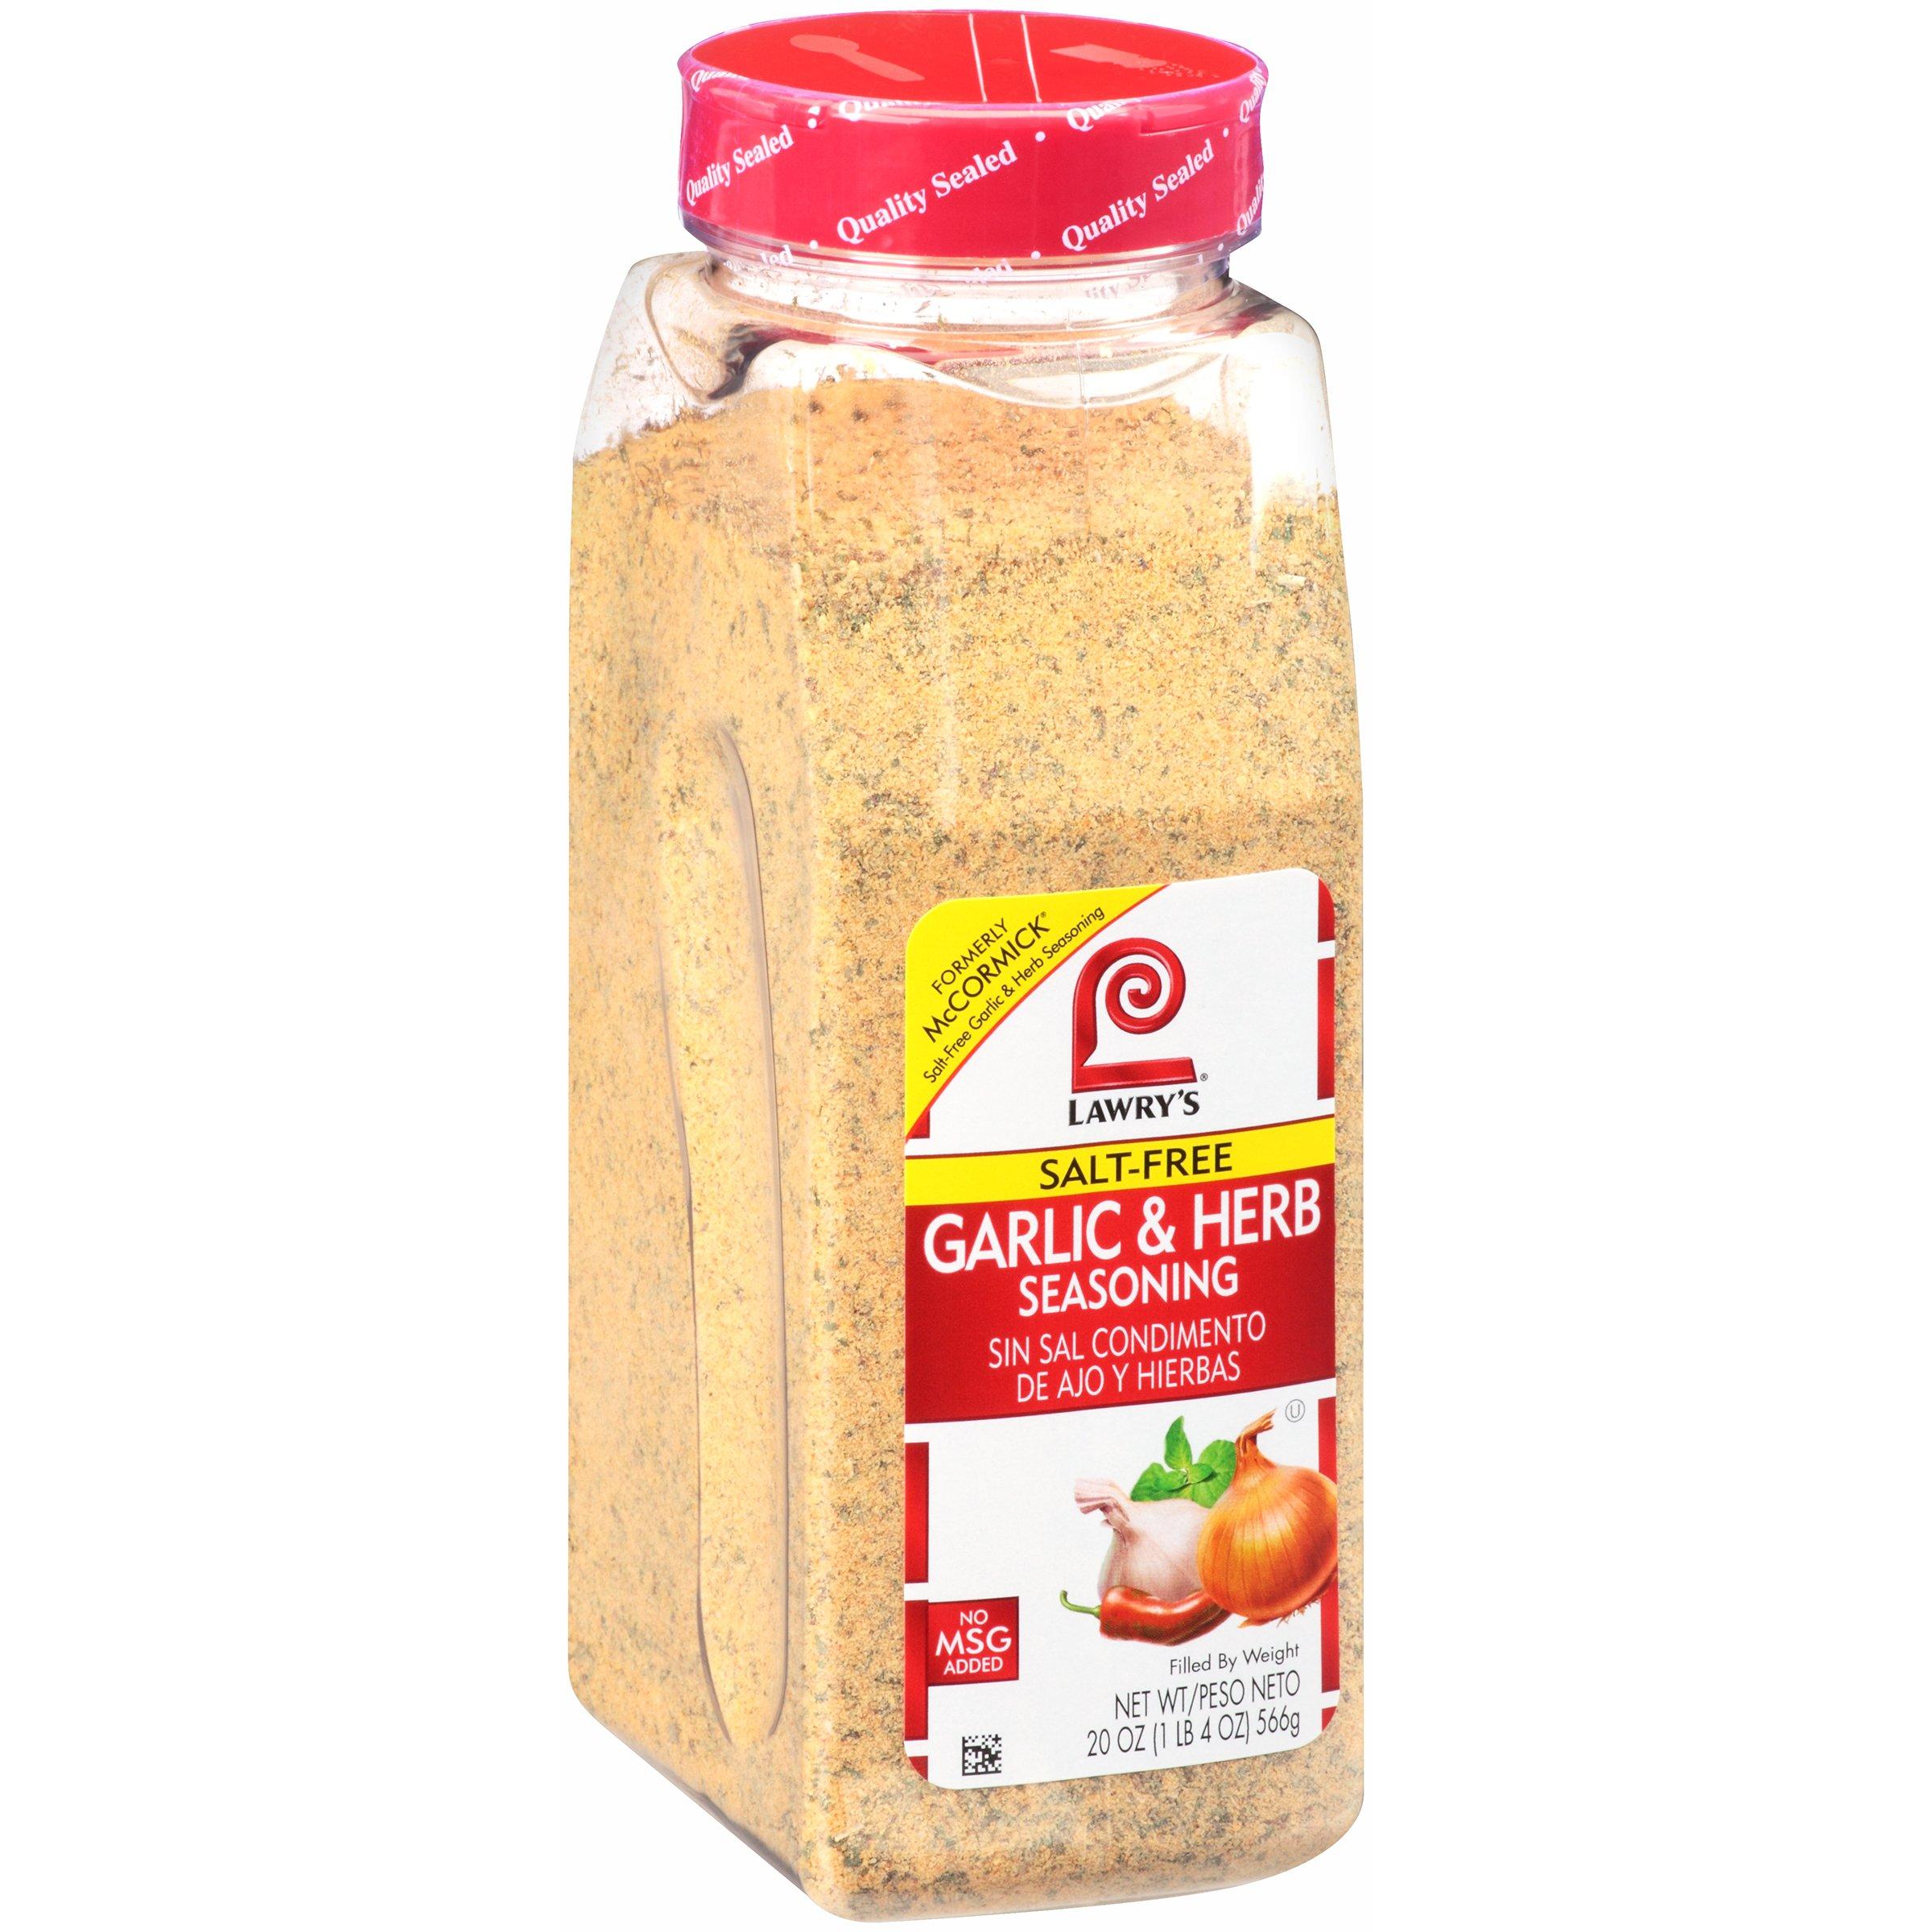 Lawry's Salt Free Garlic & Herb Seasoning, 20 Ounce